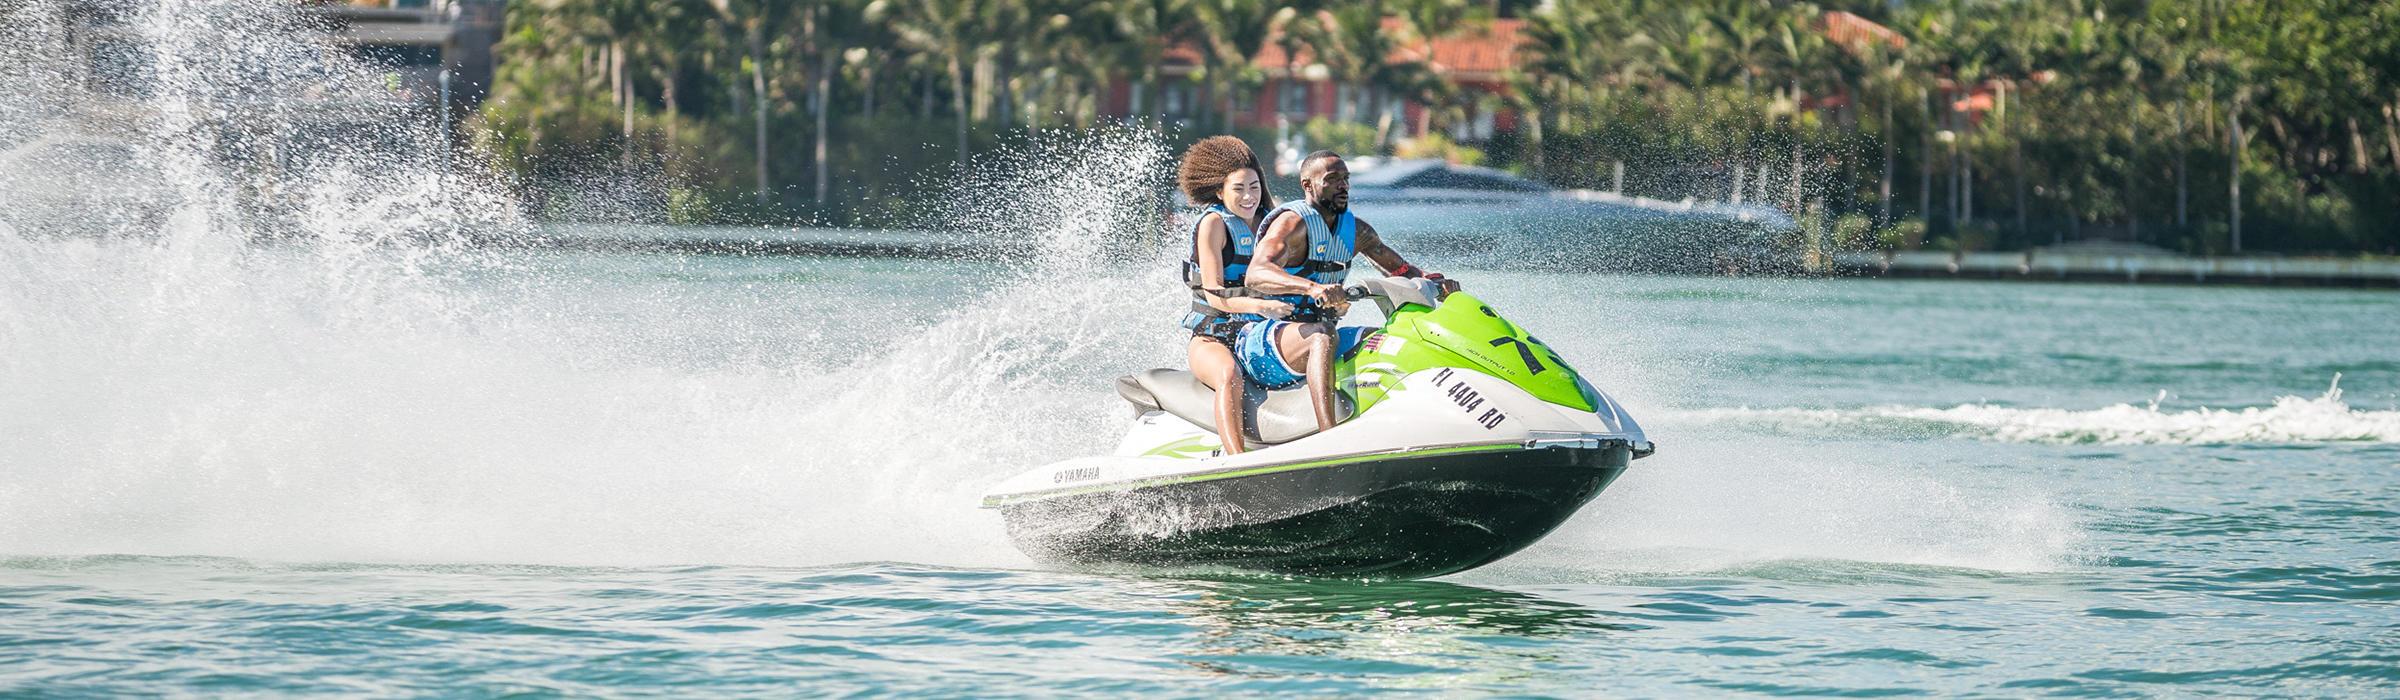 BouYah Watersports - Hilton Clearwater image 0